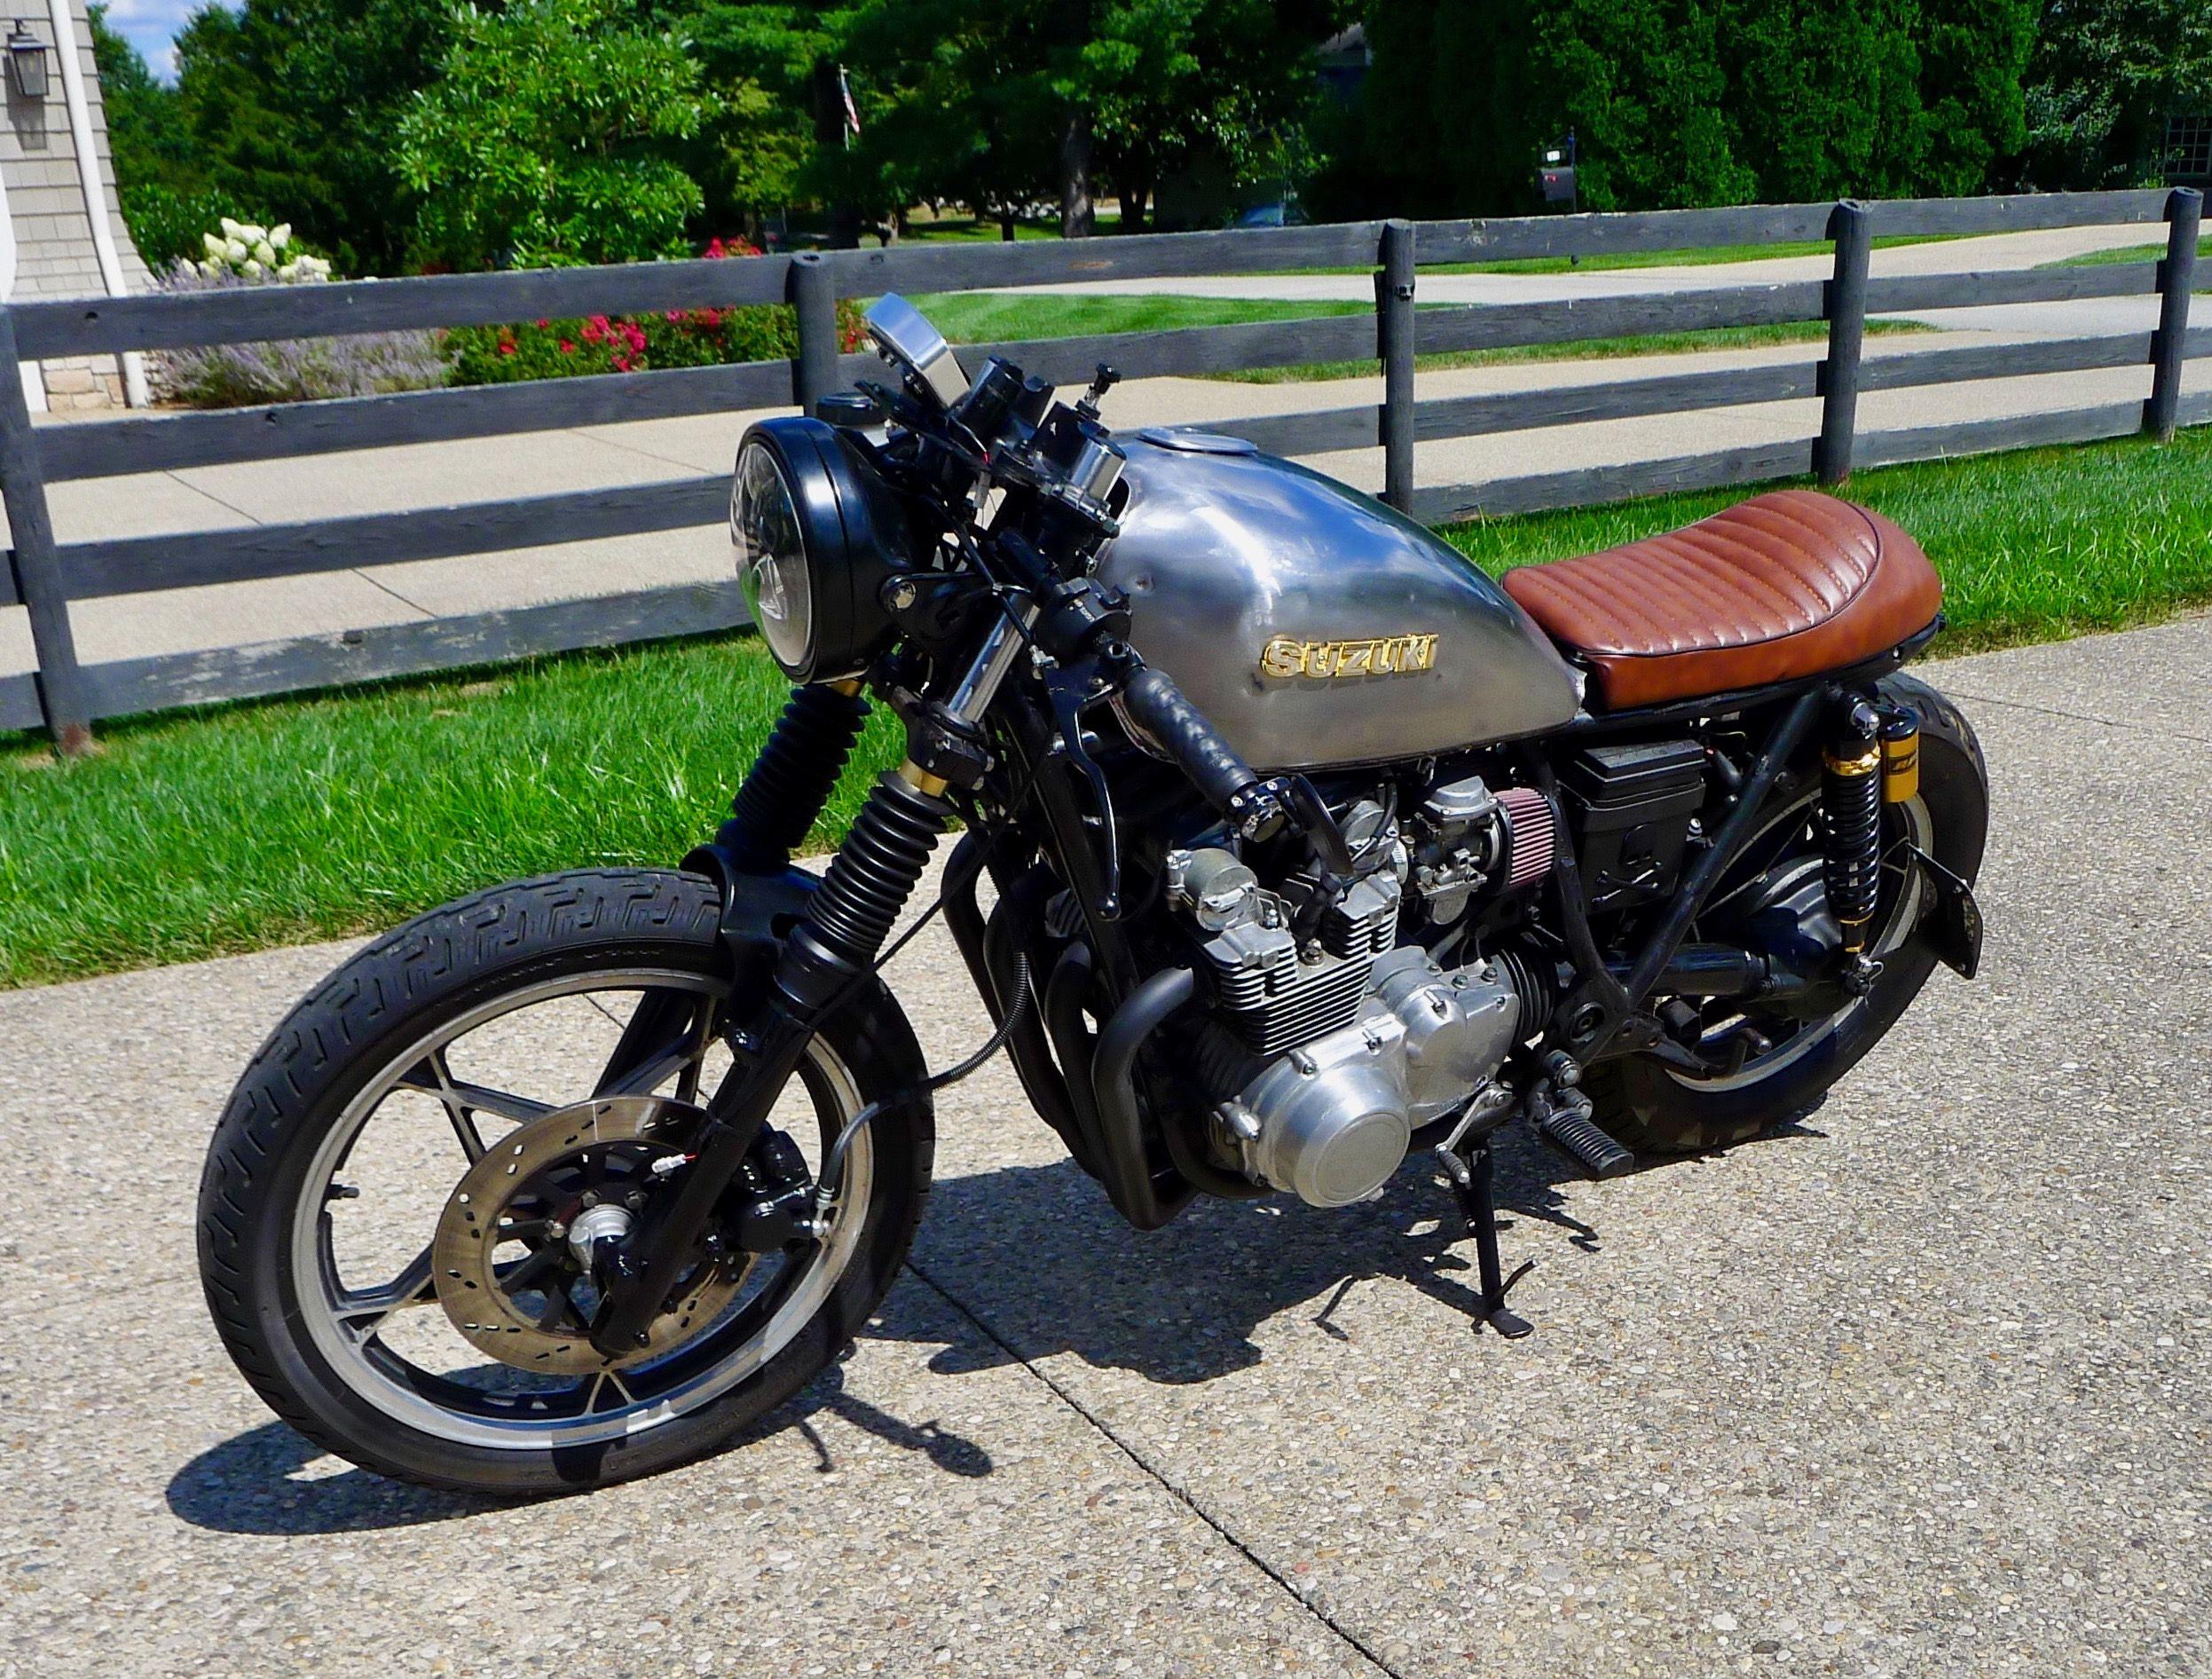 1981 Suzuki Gs450 Cafe Racer Custom Cafe Racer Motorcycles For Sale Cafe Racer Headlight Cafe Racer Custom Cafe Racer